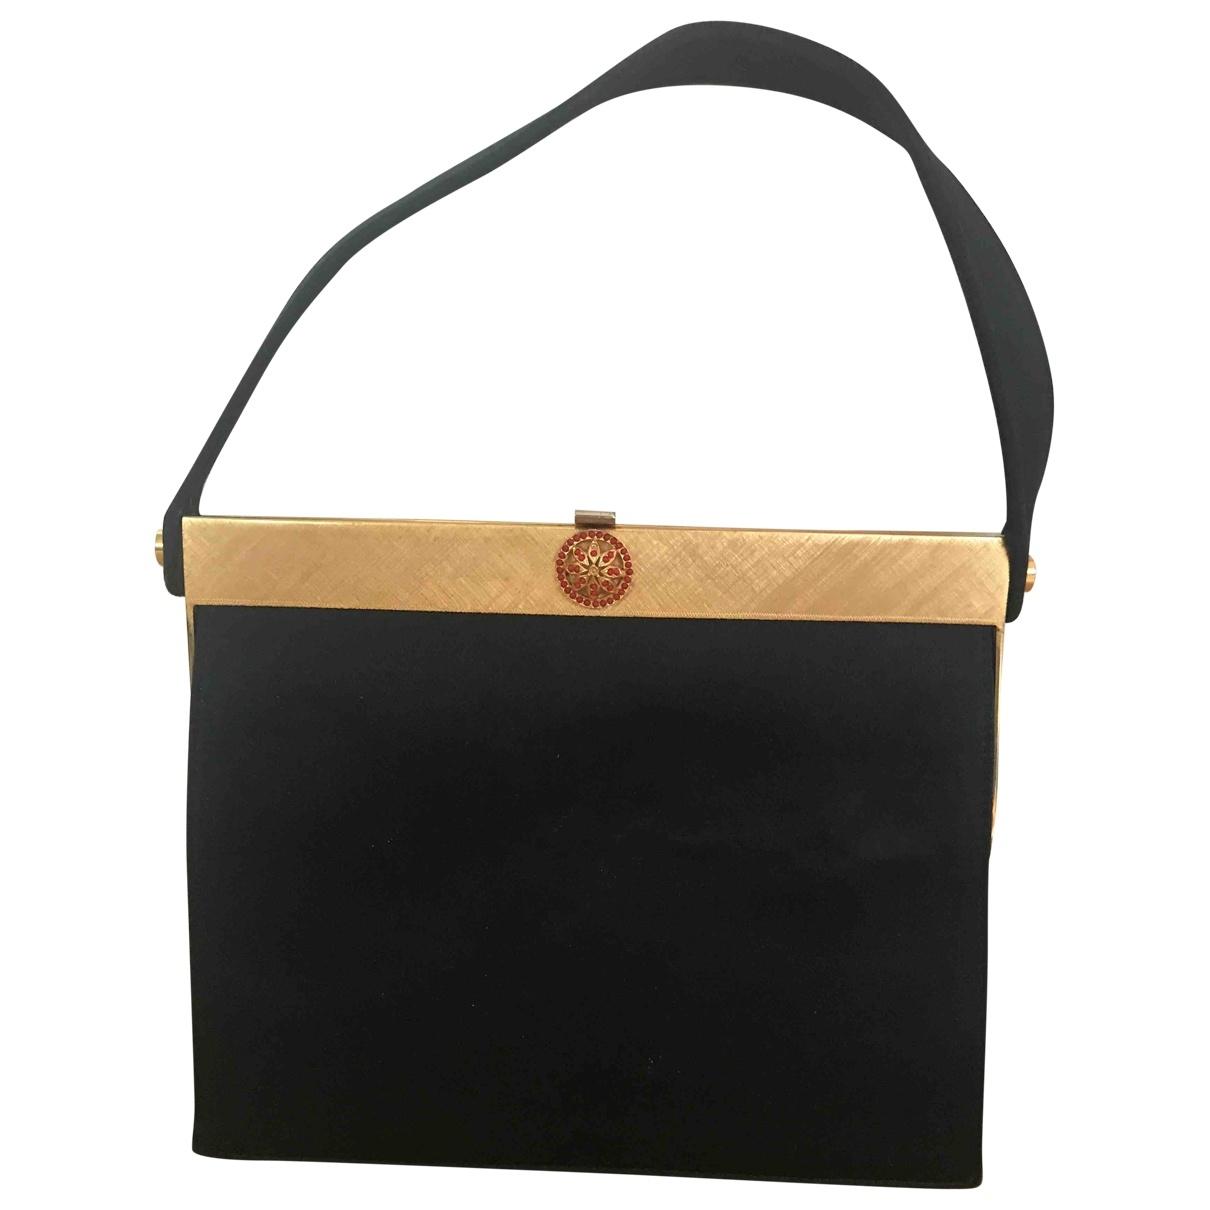 Loewe \N Handtasche in  Schwarz Leinen